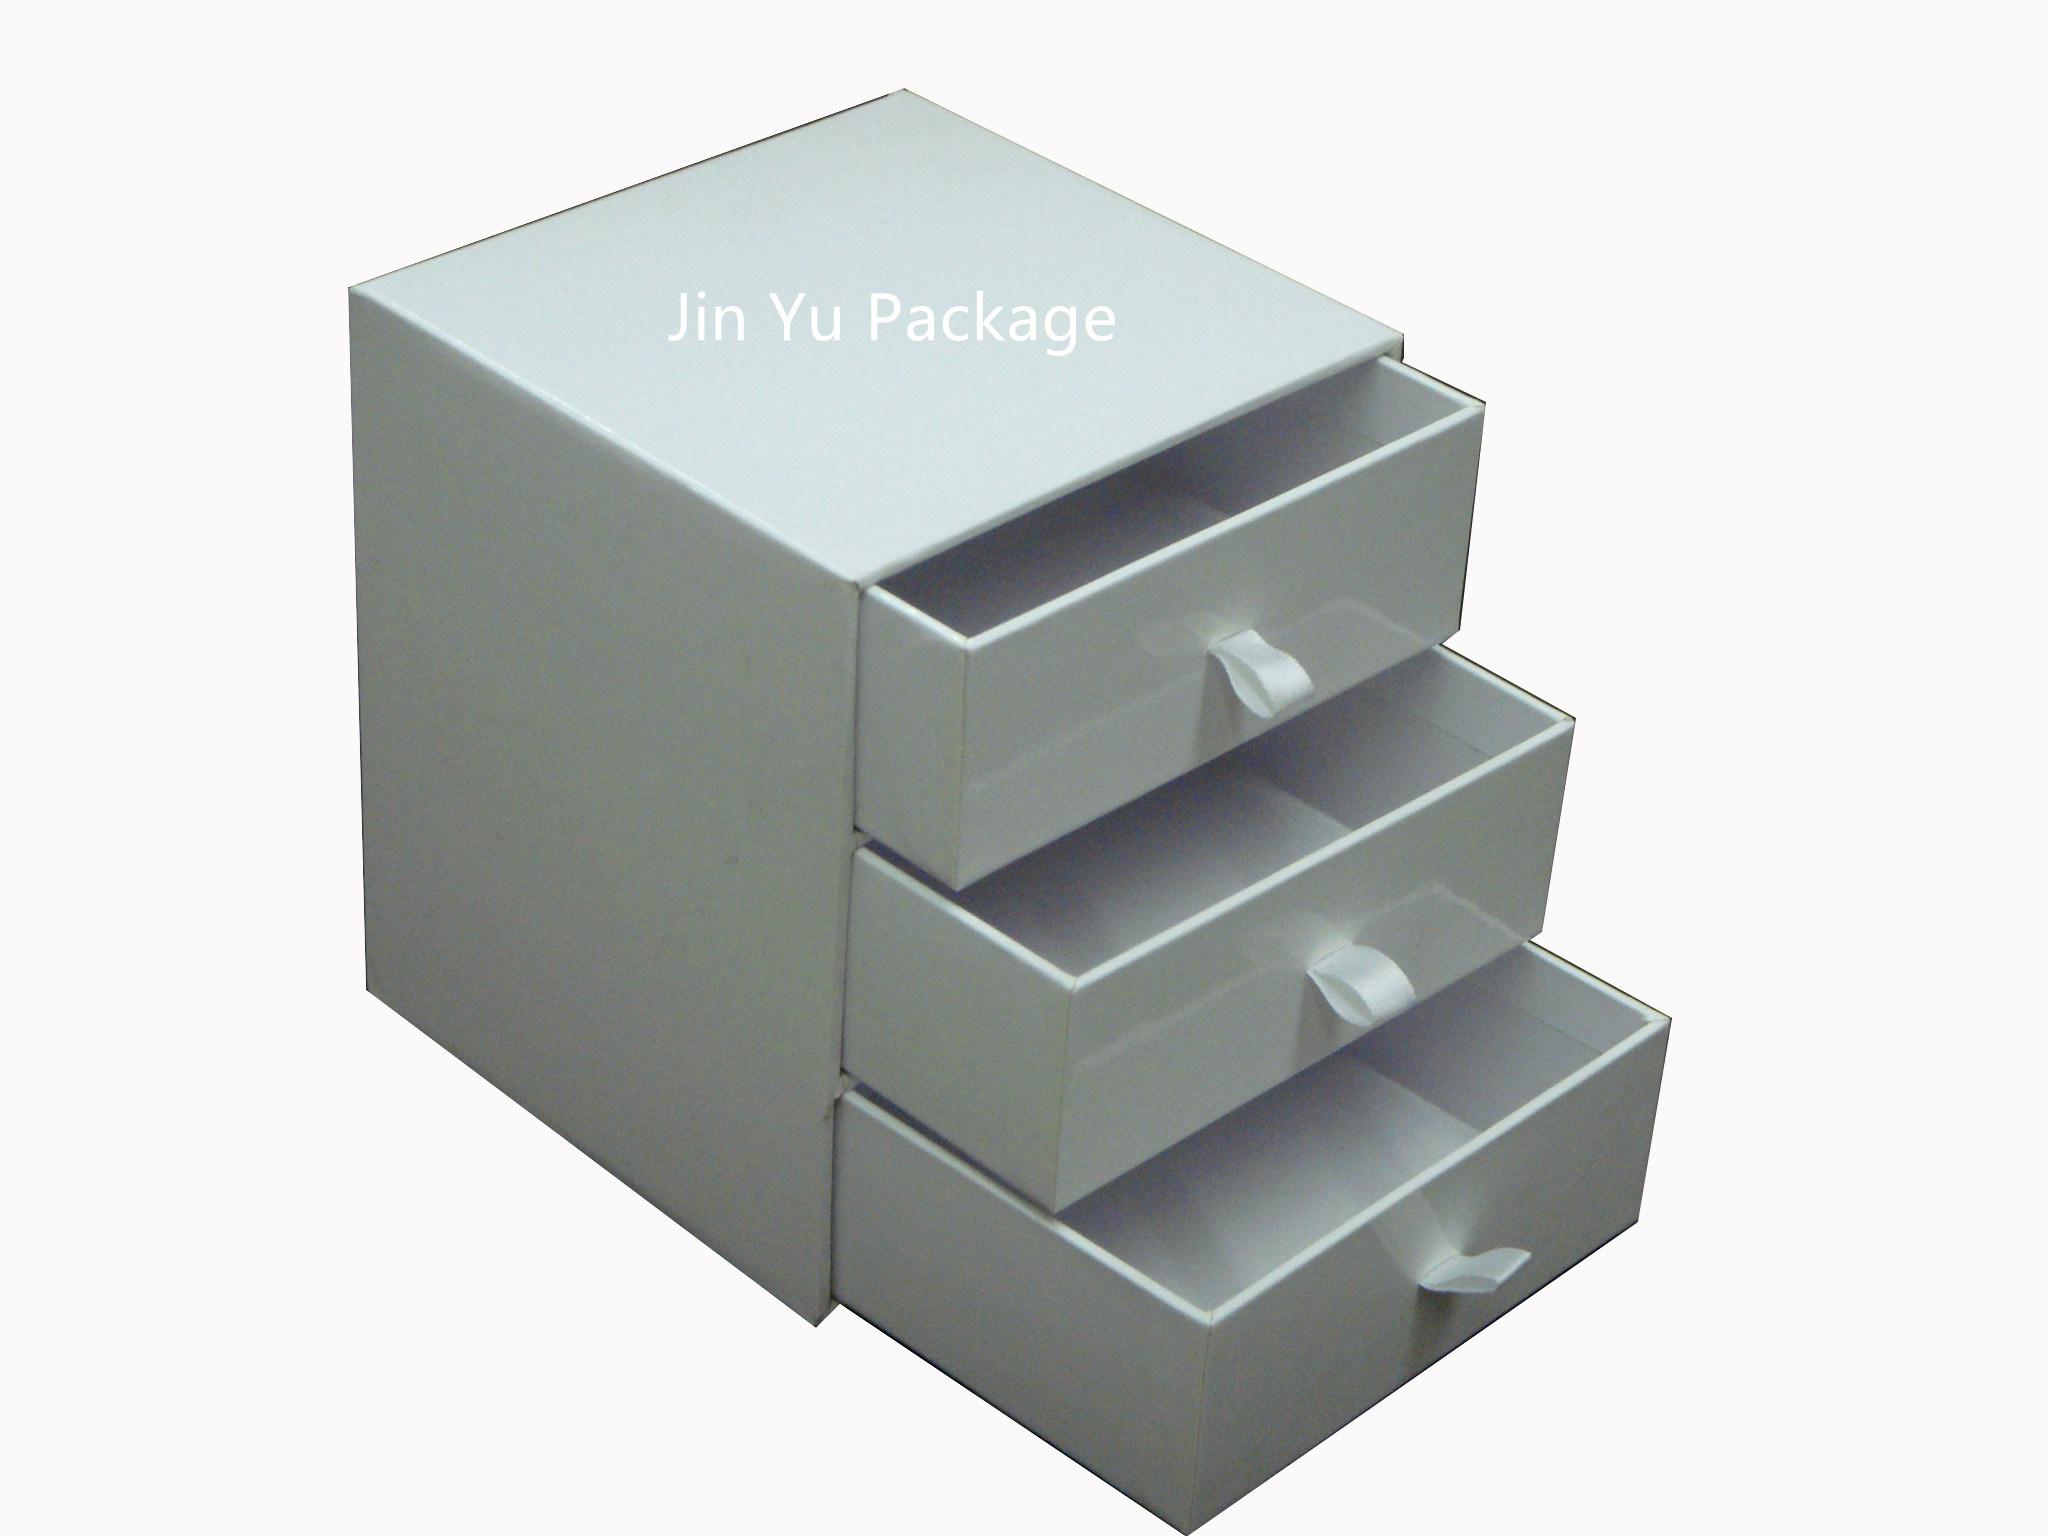 Storage produce rigid artificial leather, type of cardboard